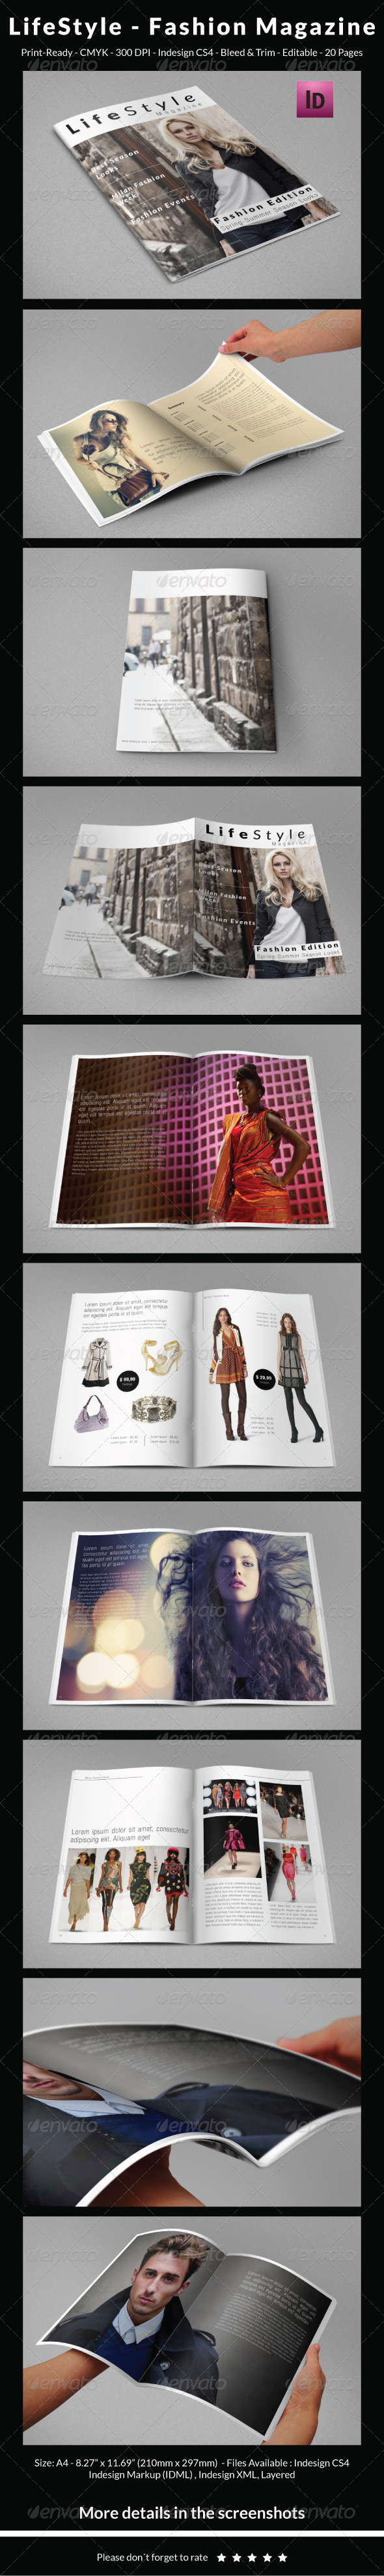 GraphicRiver LifeStyle Fashion Magazine 6316727